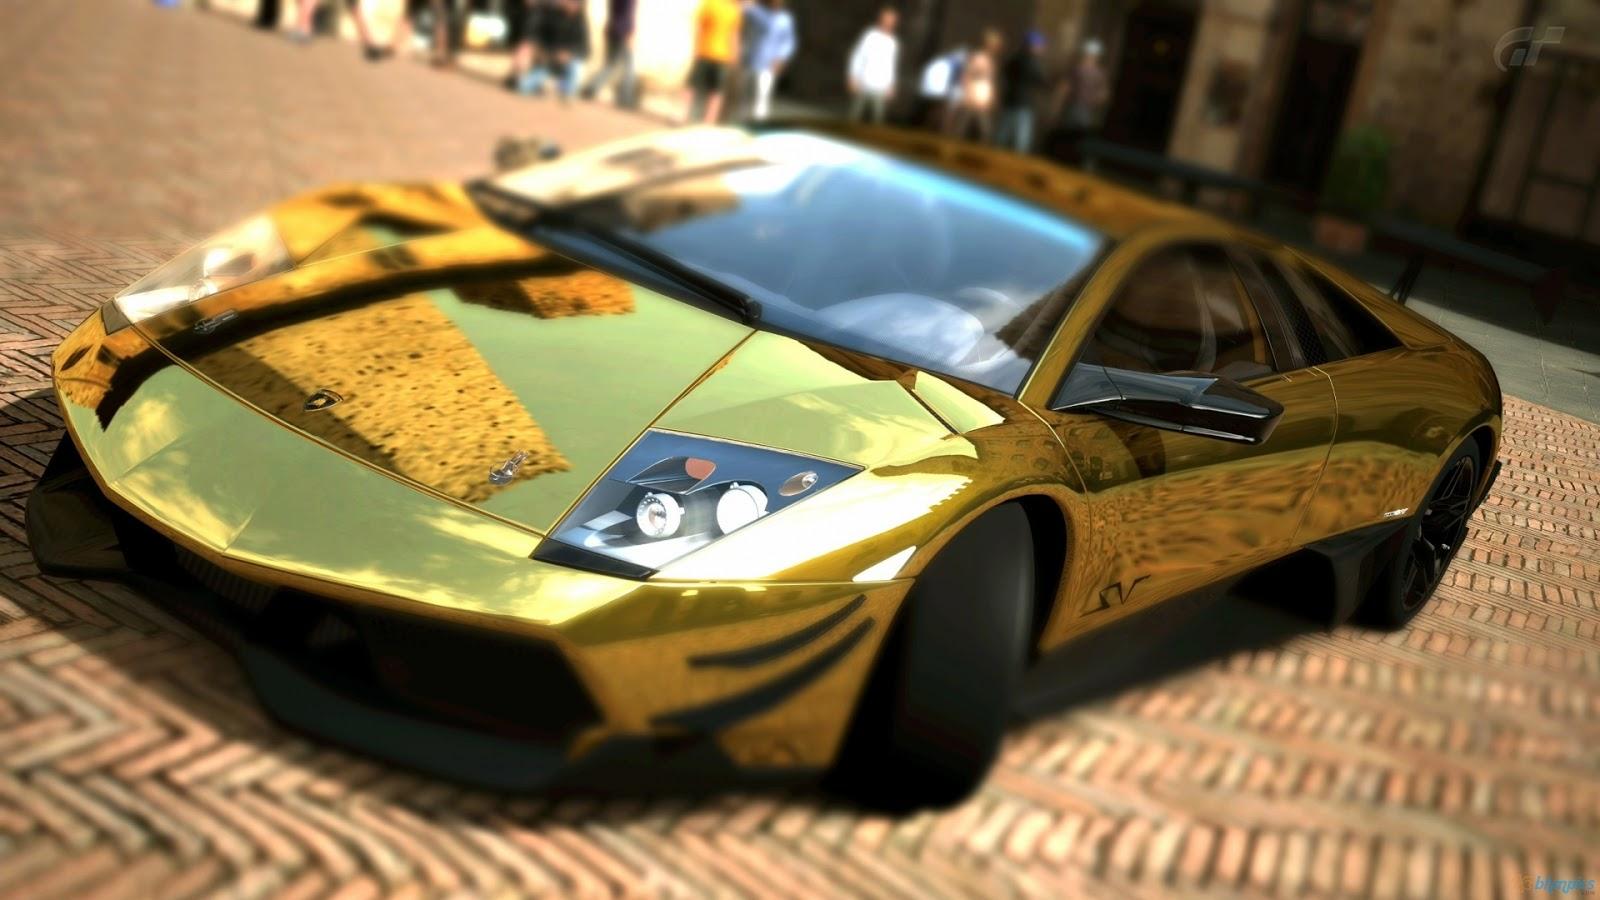 46 Cool Gold Cars Wallpapers On Wallpapersafari